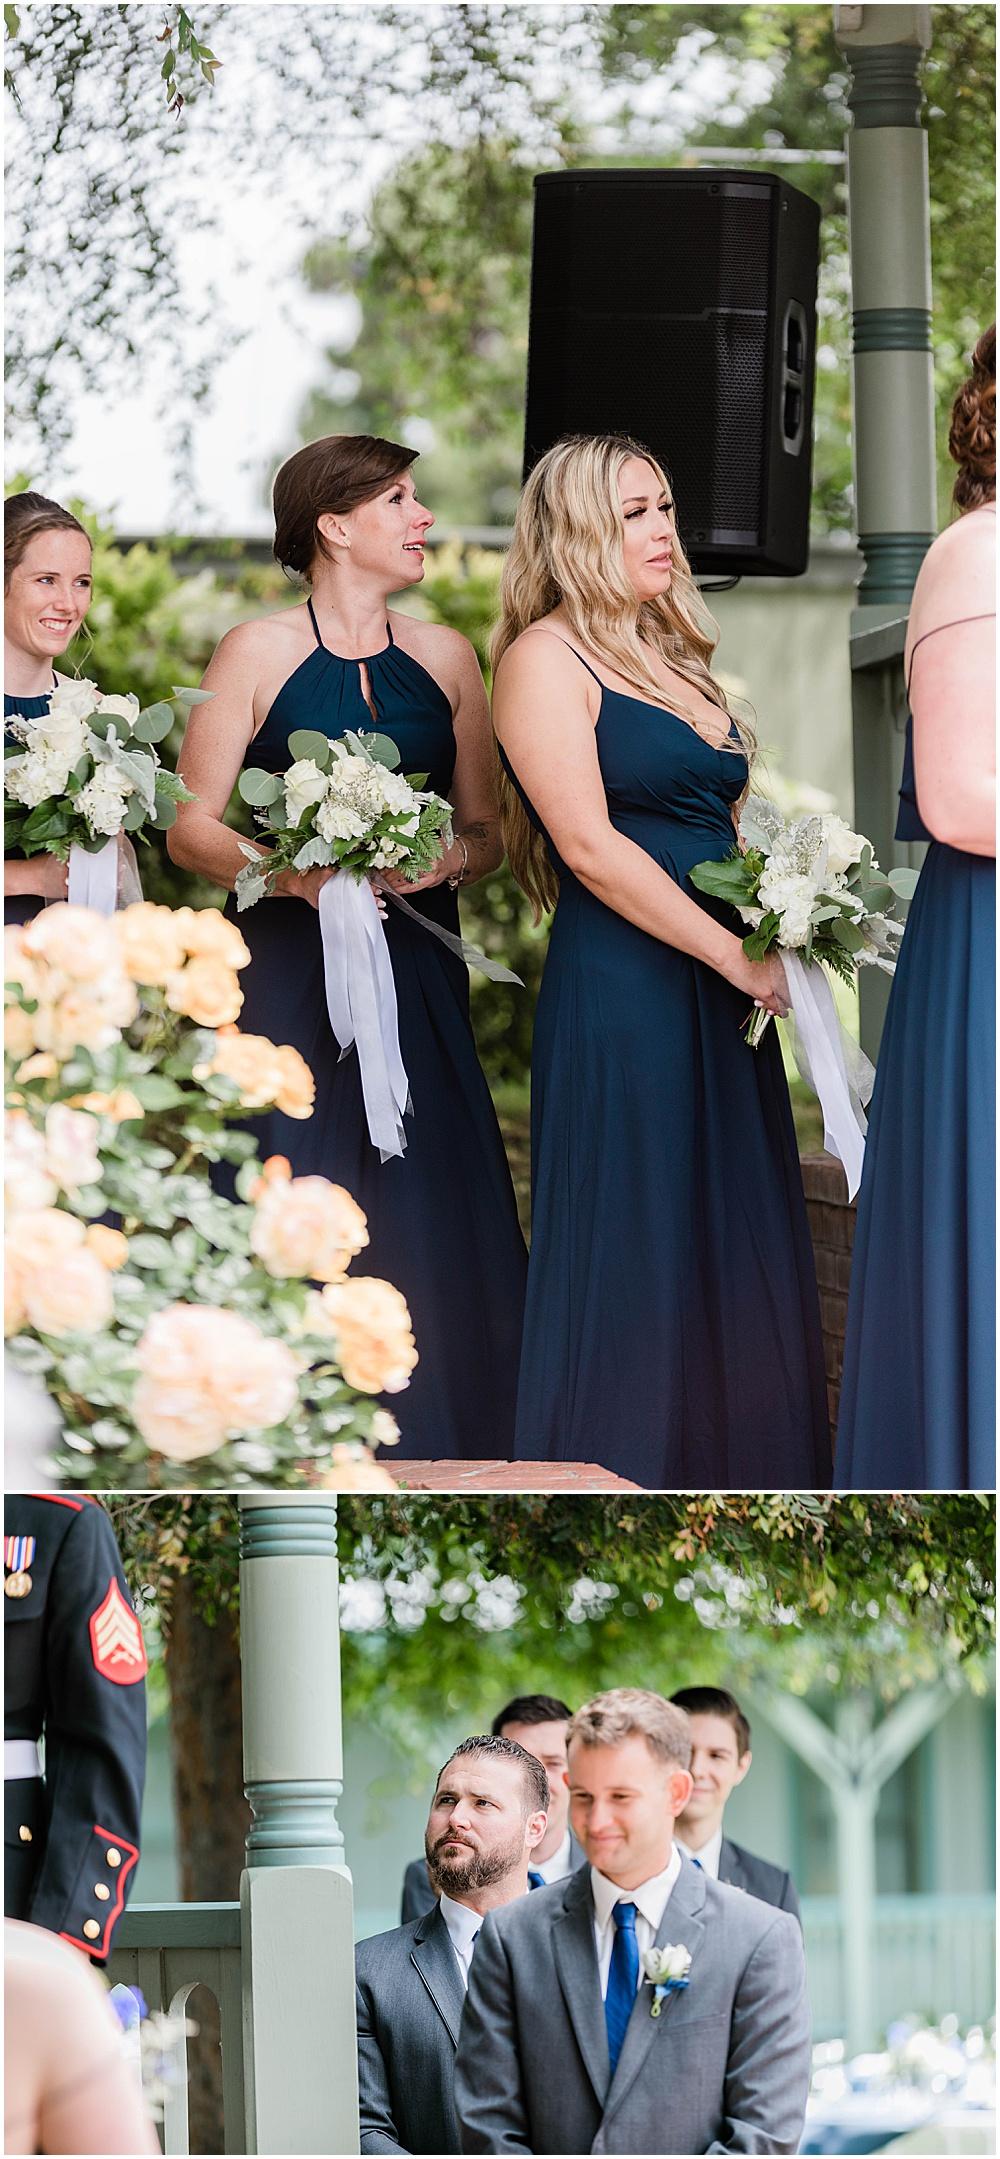 Samantha McPherrin Photography-Chico Wedding Photographer_0051.jpg